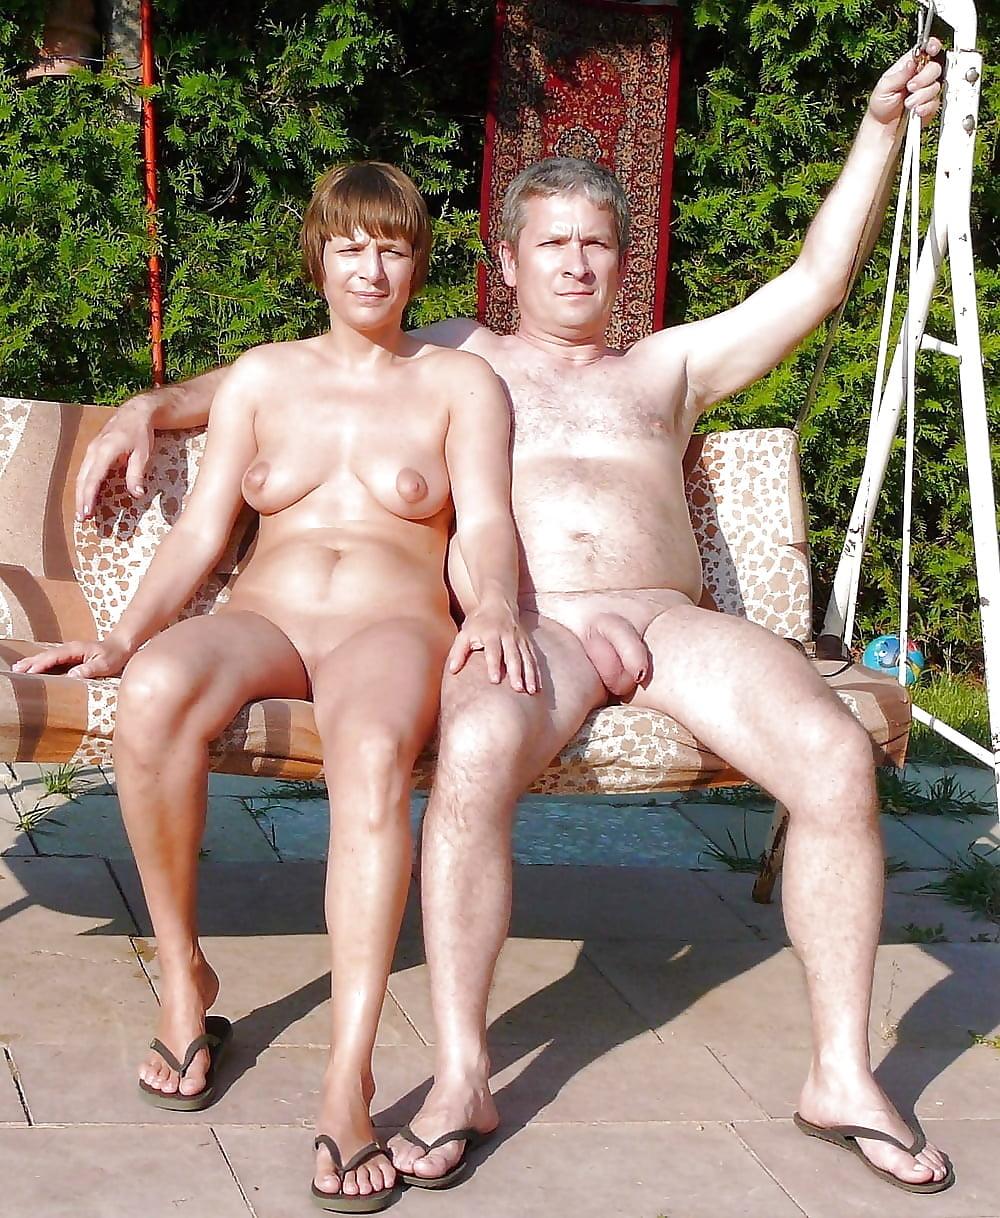 Erotic mature couples nude